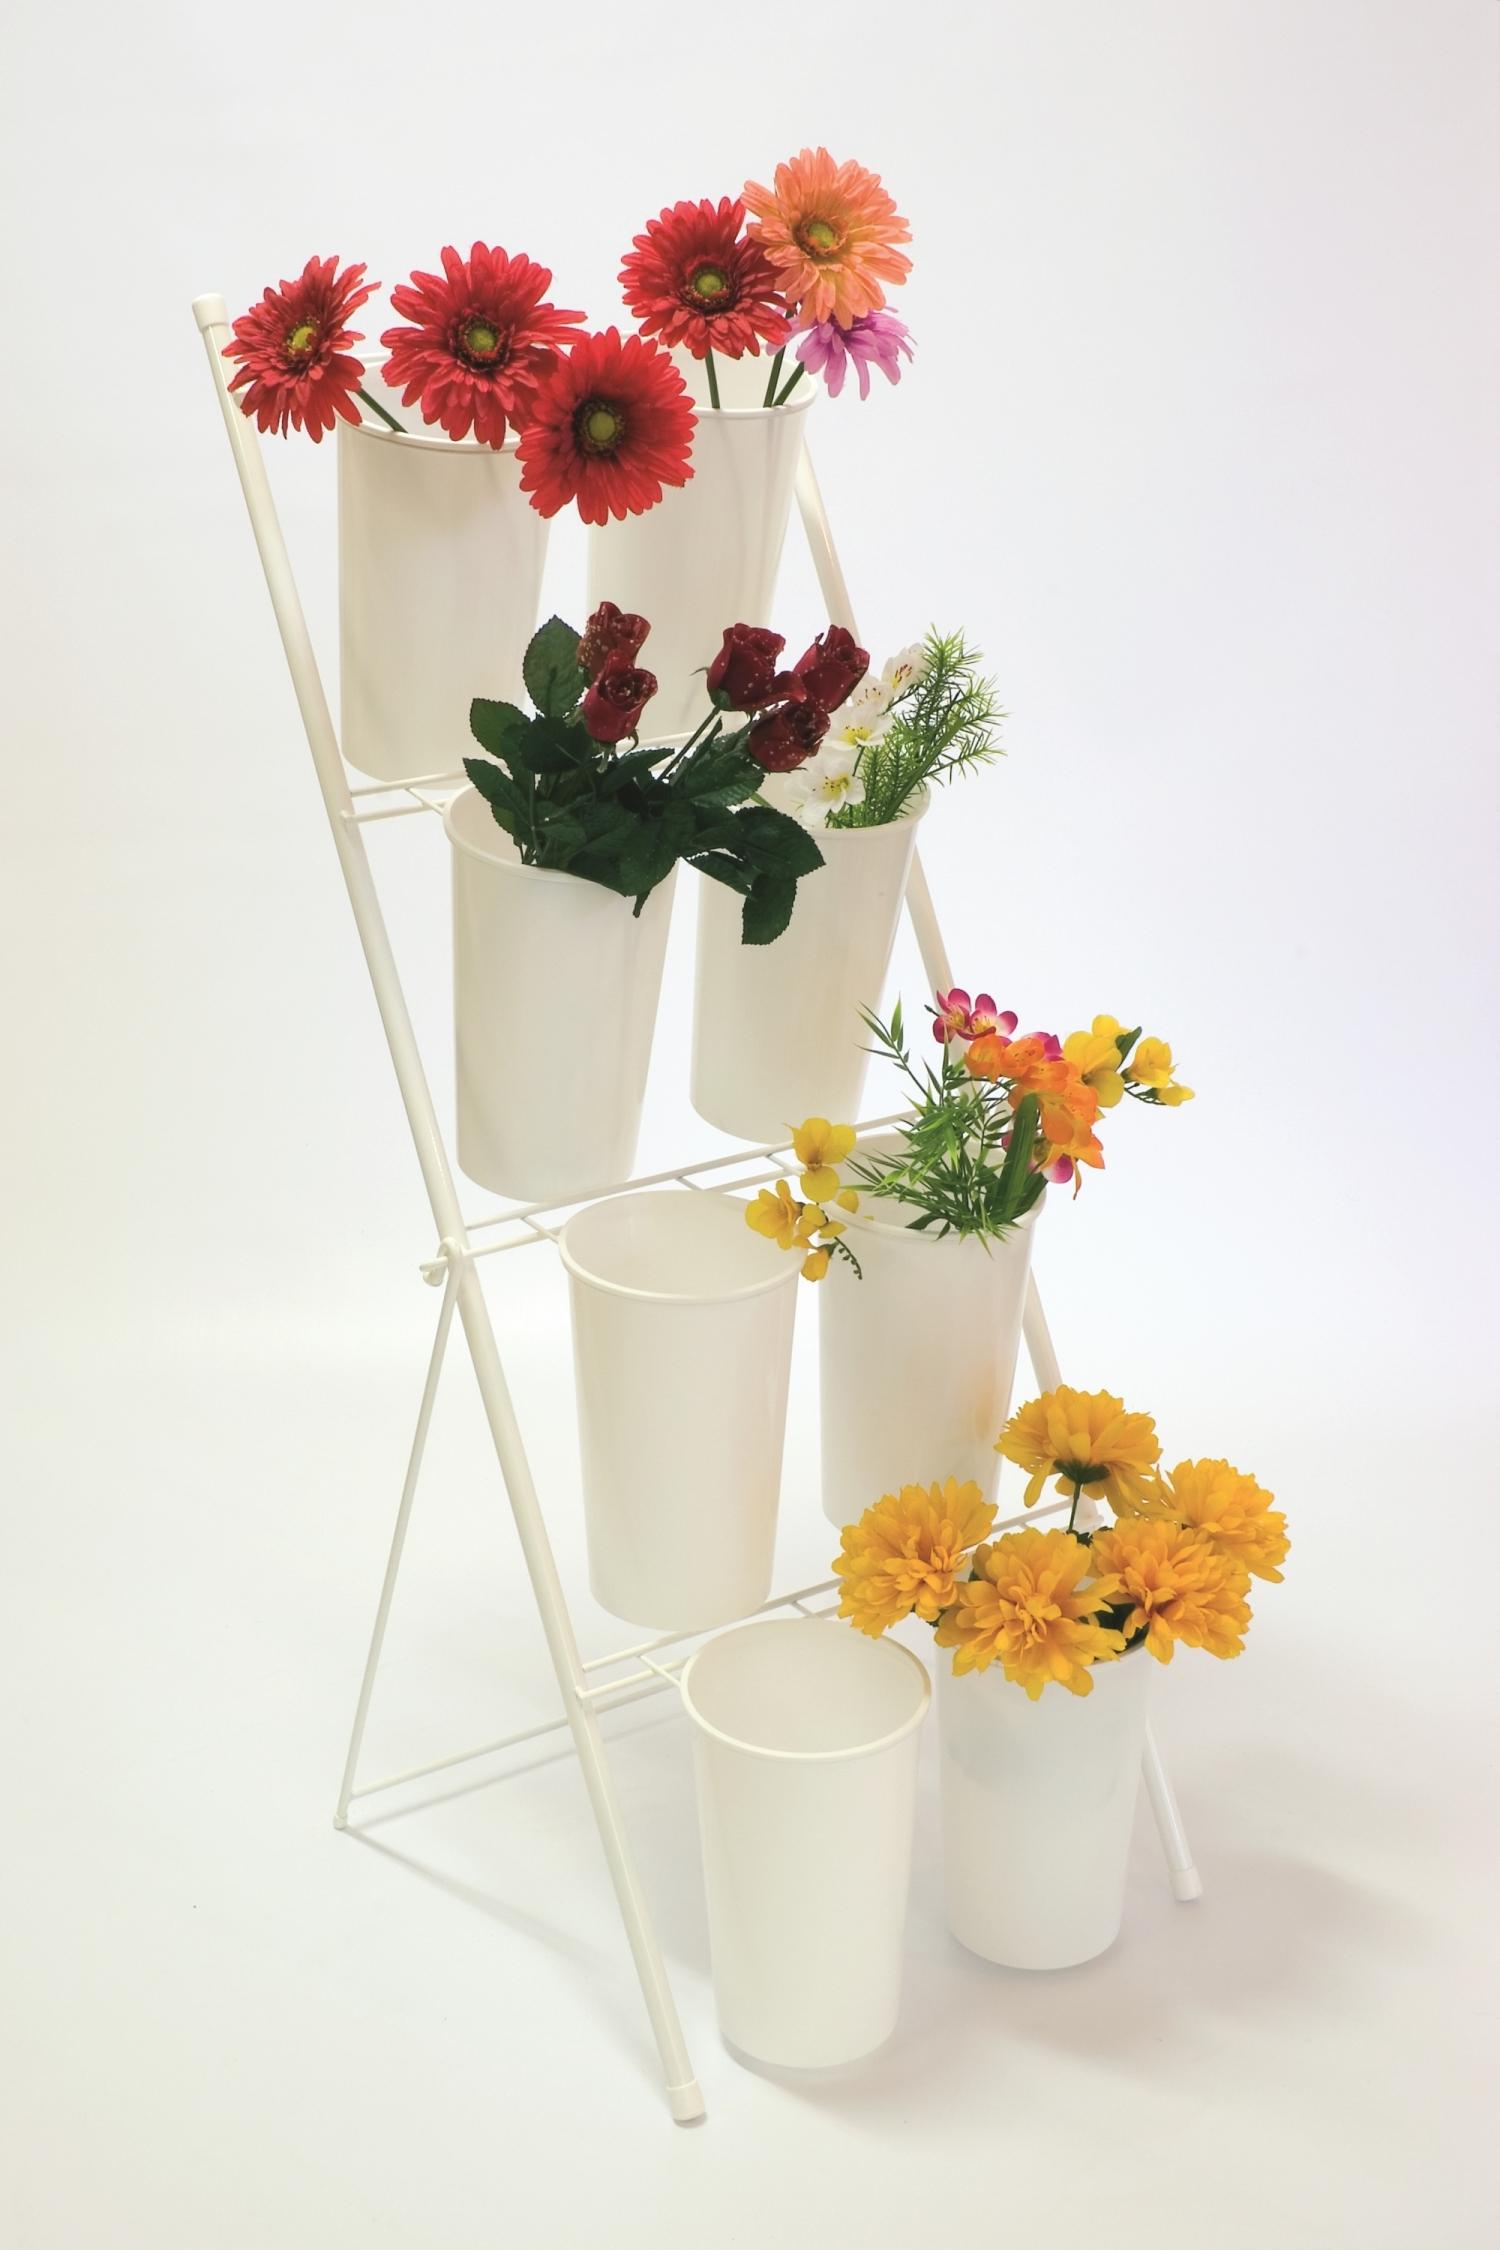 květinový stojan, Kovodružstvo, v.d., Beroun